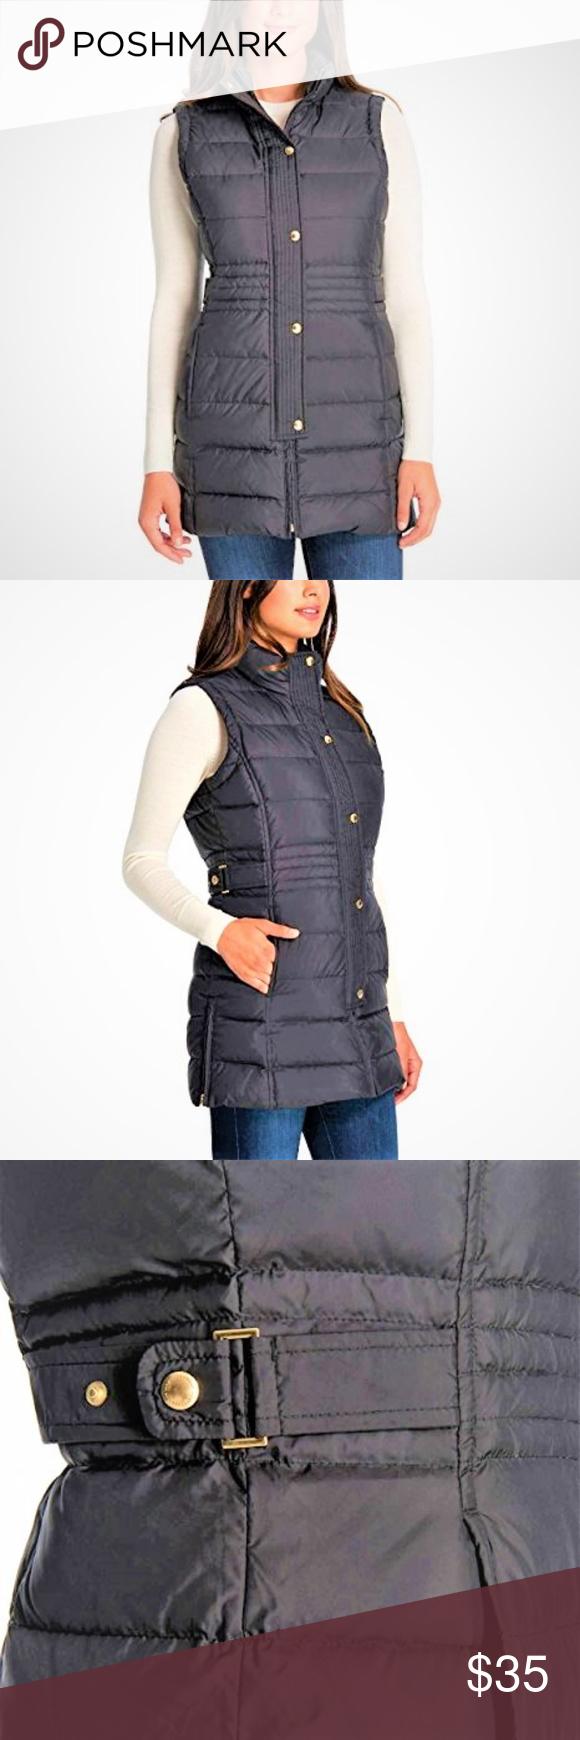 70ed974b11050 Weatherproof Women s Long Down Fill Puffer Vest Weatherproof Ladies  Long  Down Vest for Women ~Navy Blue ~ Down Fill Shell  100% Polyester Fill  60%  ...